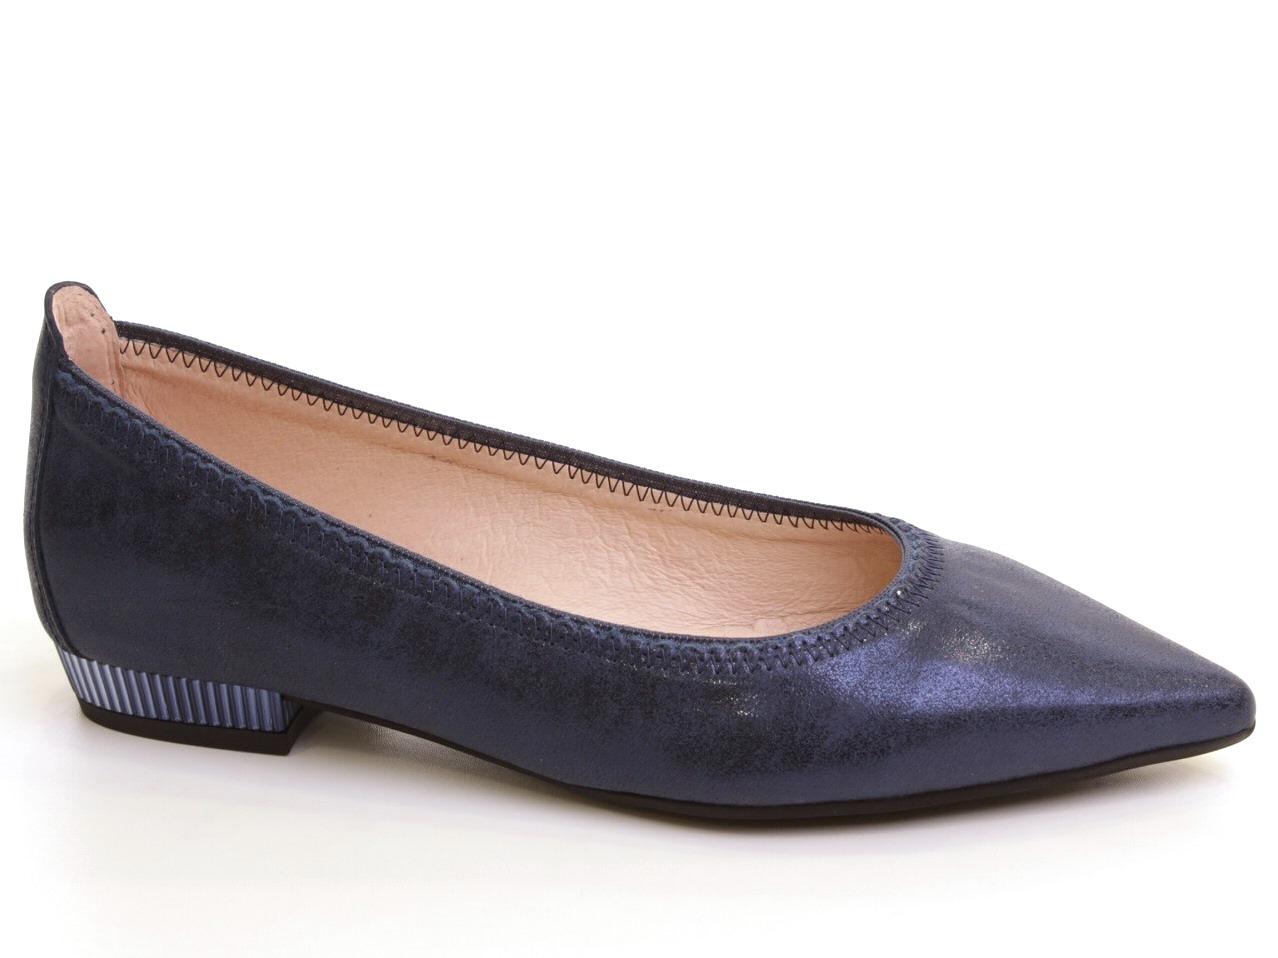 Flat Shoes, Ballerinas, Mocassins Hispanitas - 165 MHV62496